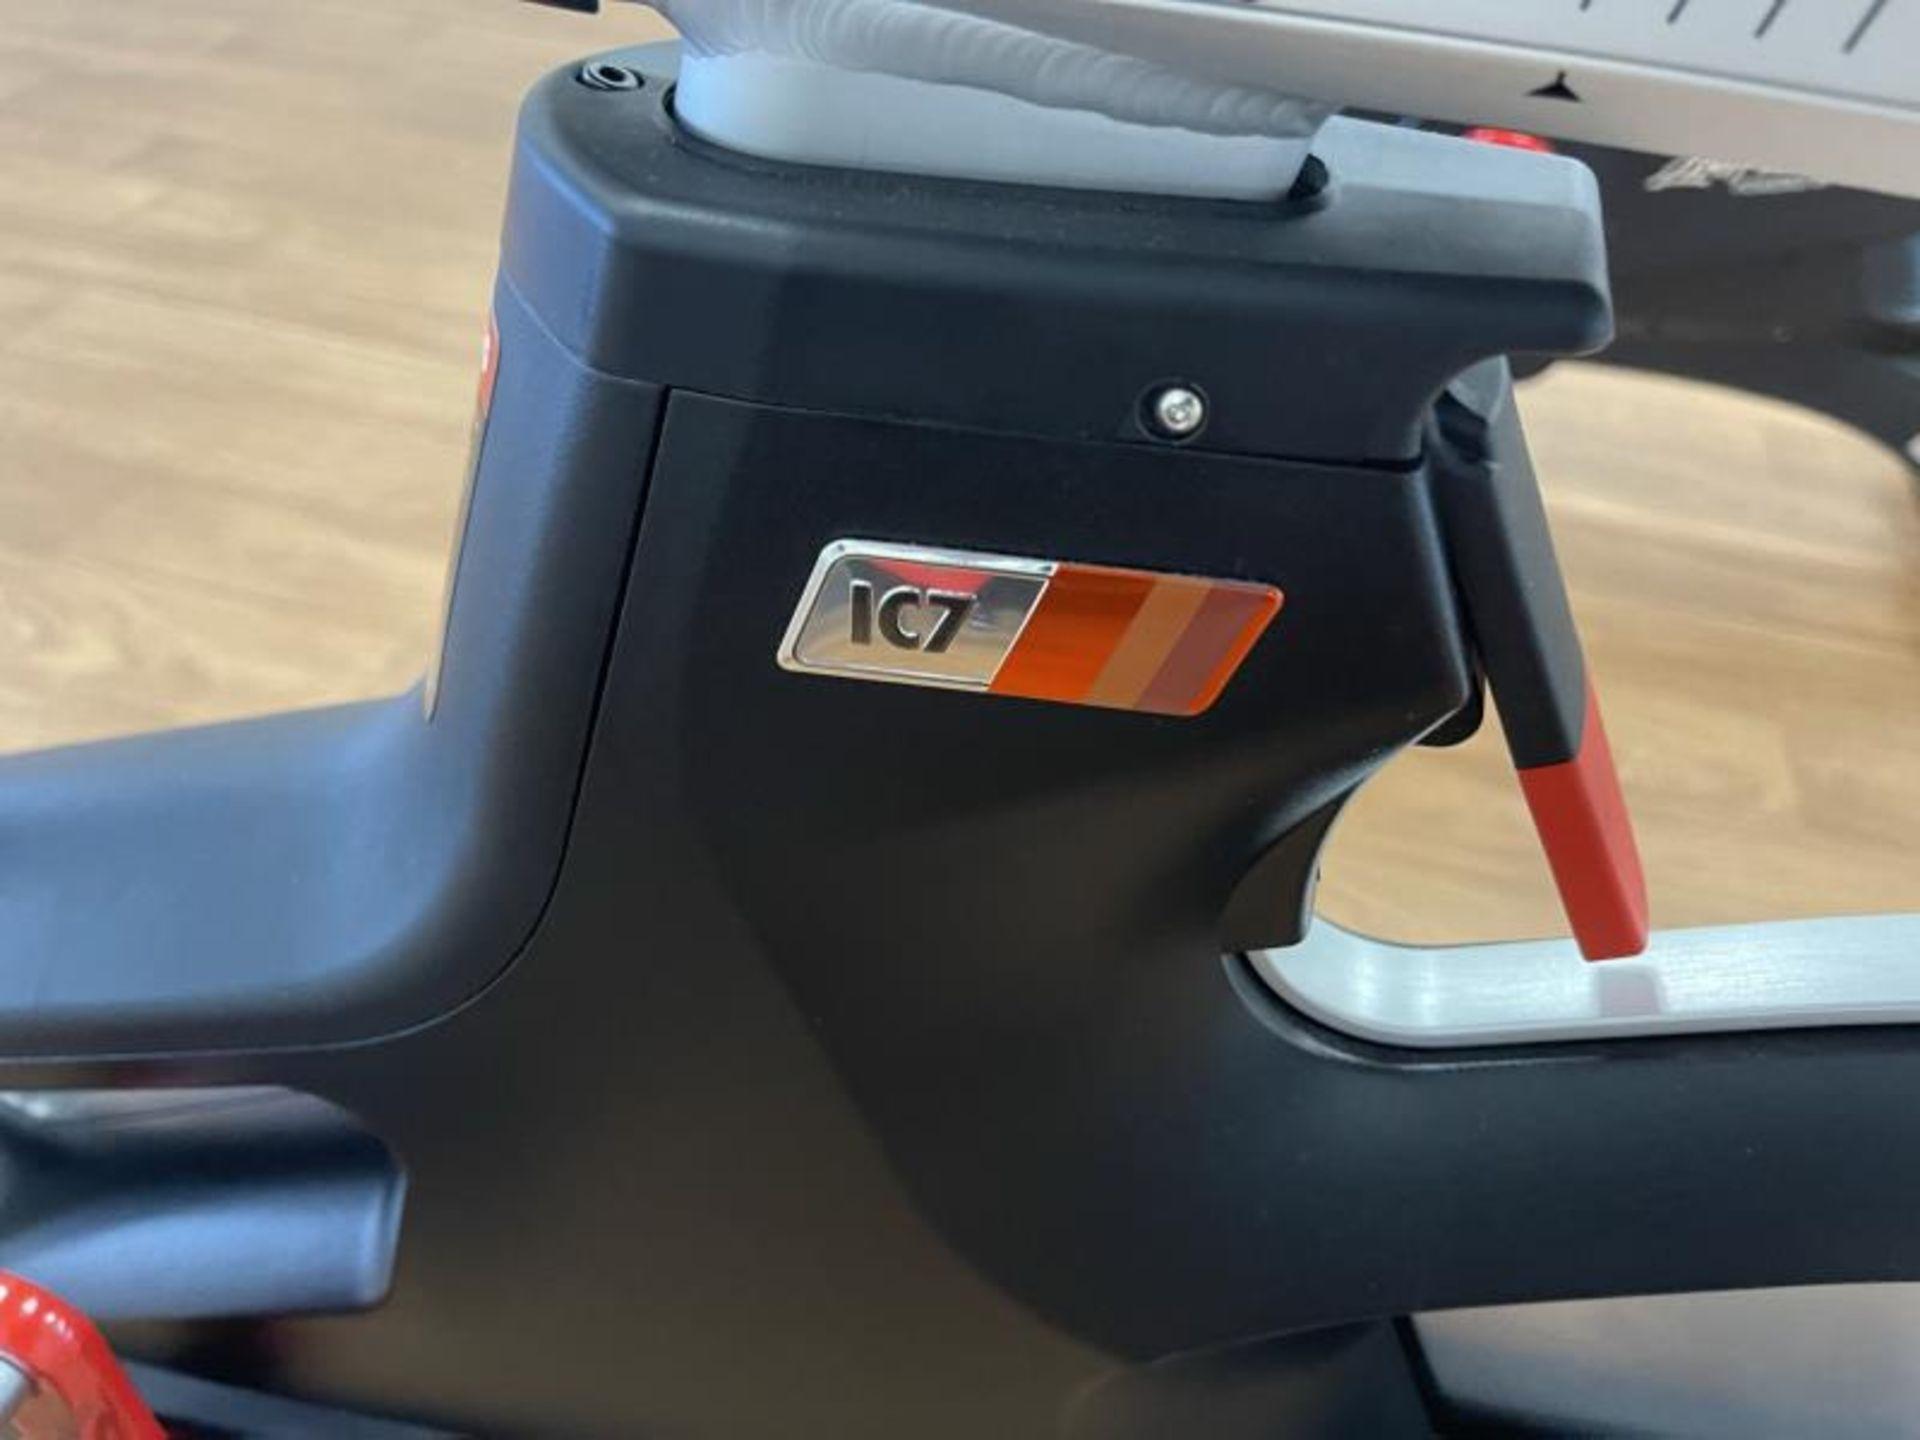 2018 Life Fitness IC7 Spin Bikes M: IC-LFIC7B2-01 - Image 4 of 5